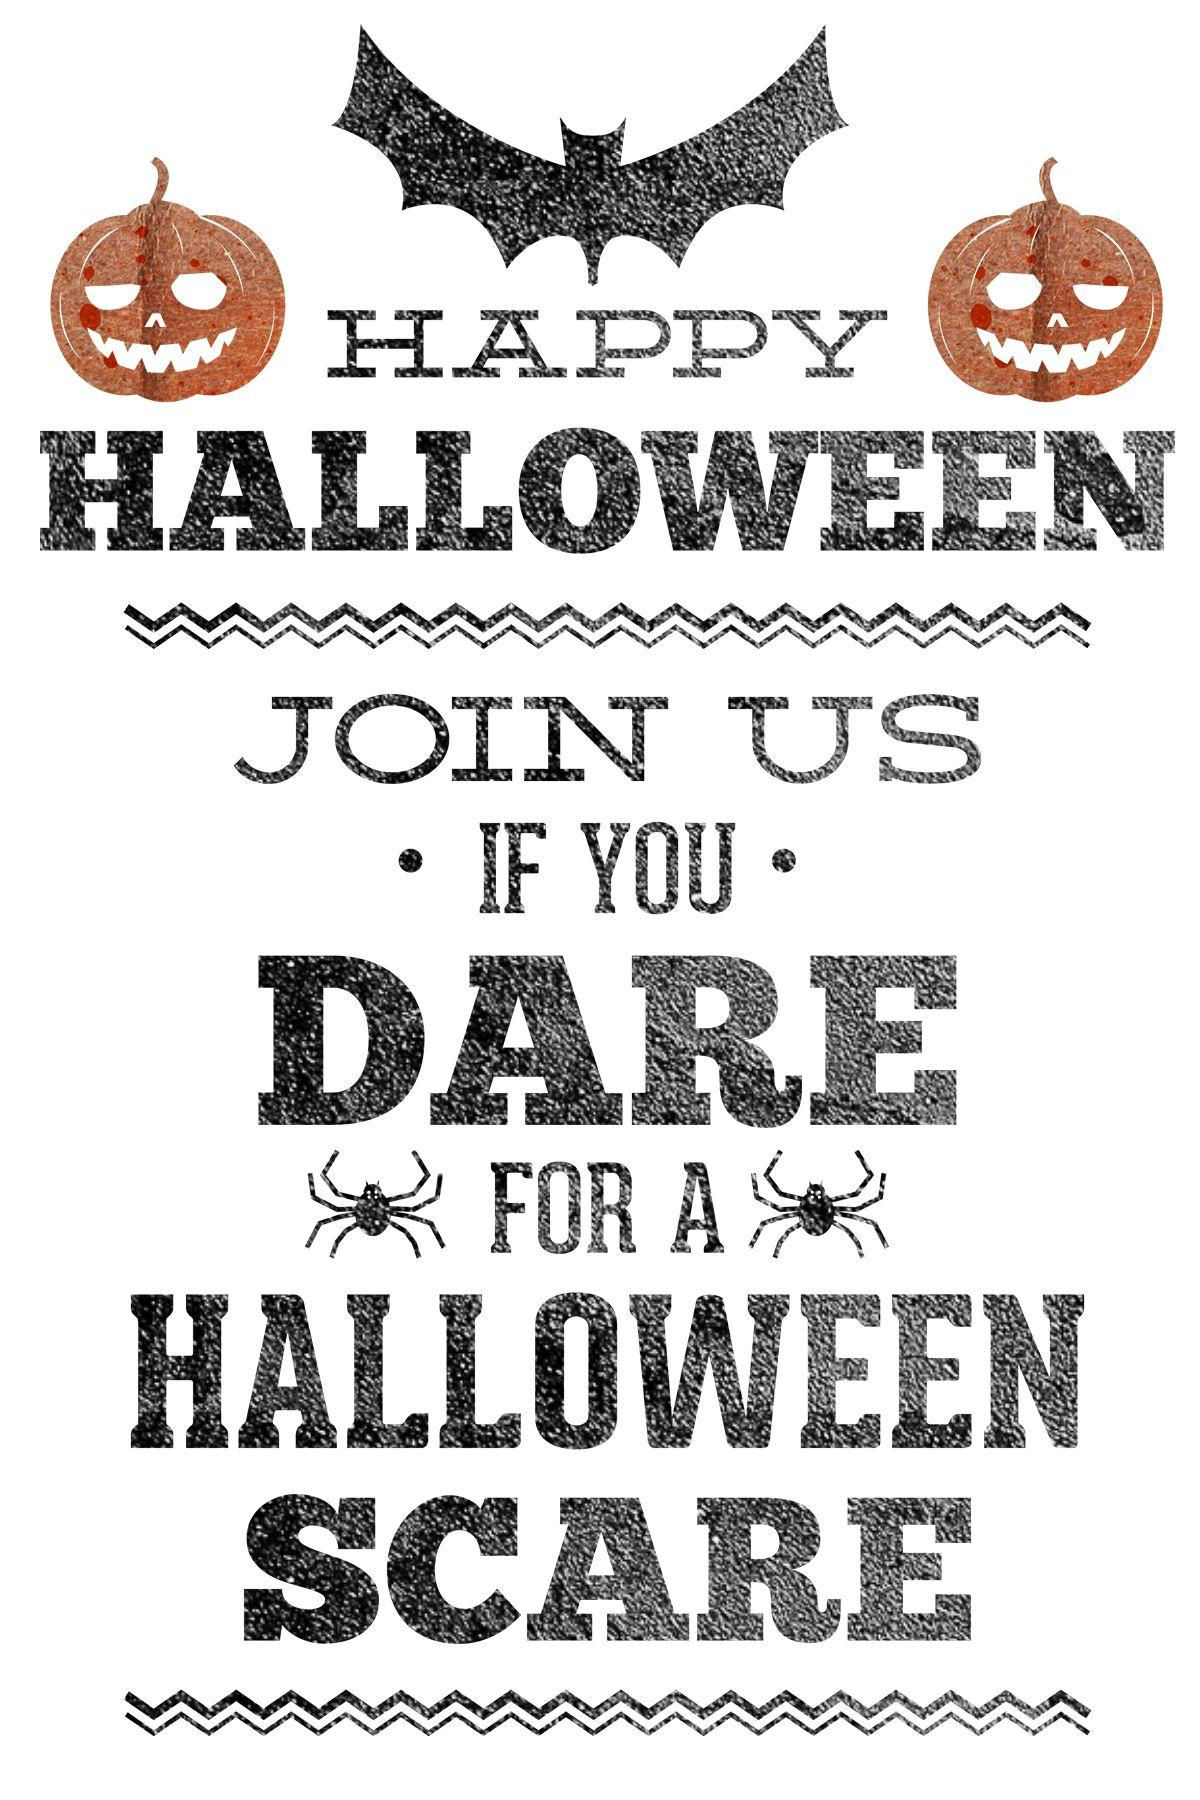 Free Printable Halloween Party Invitation | Halloween Printables 2 - Free Printable Halloween Party Decorations